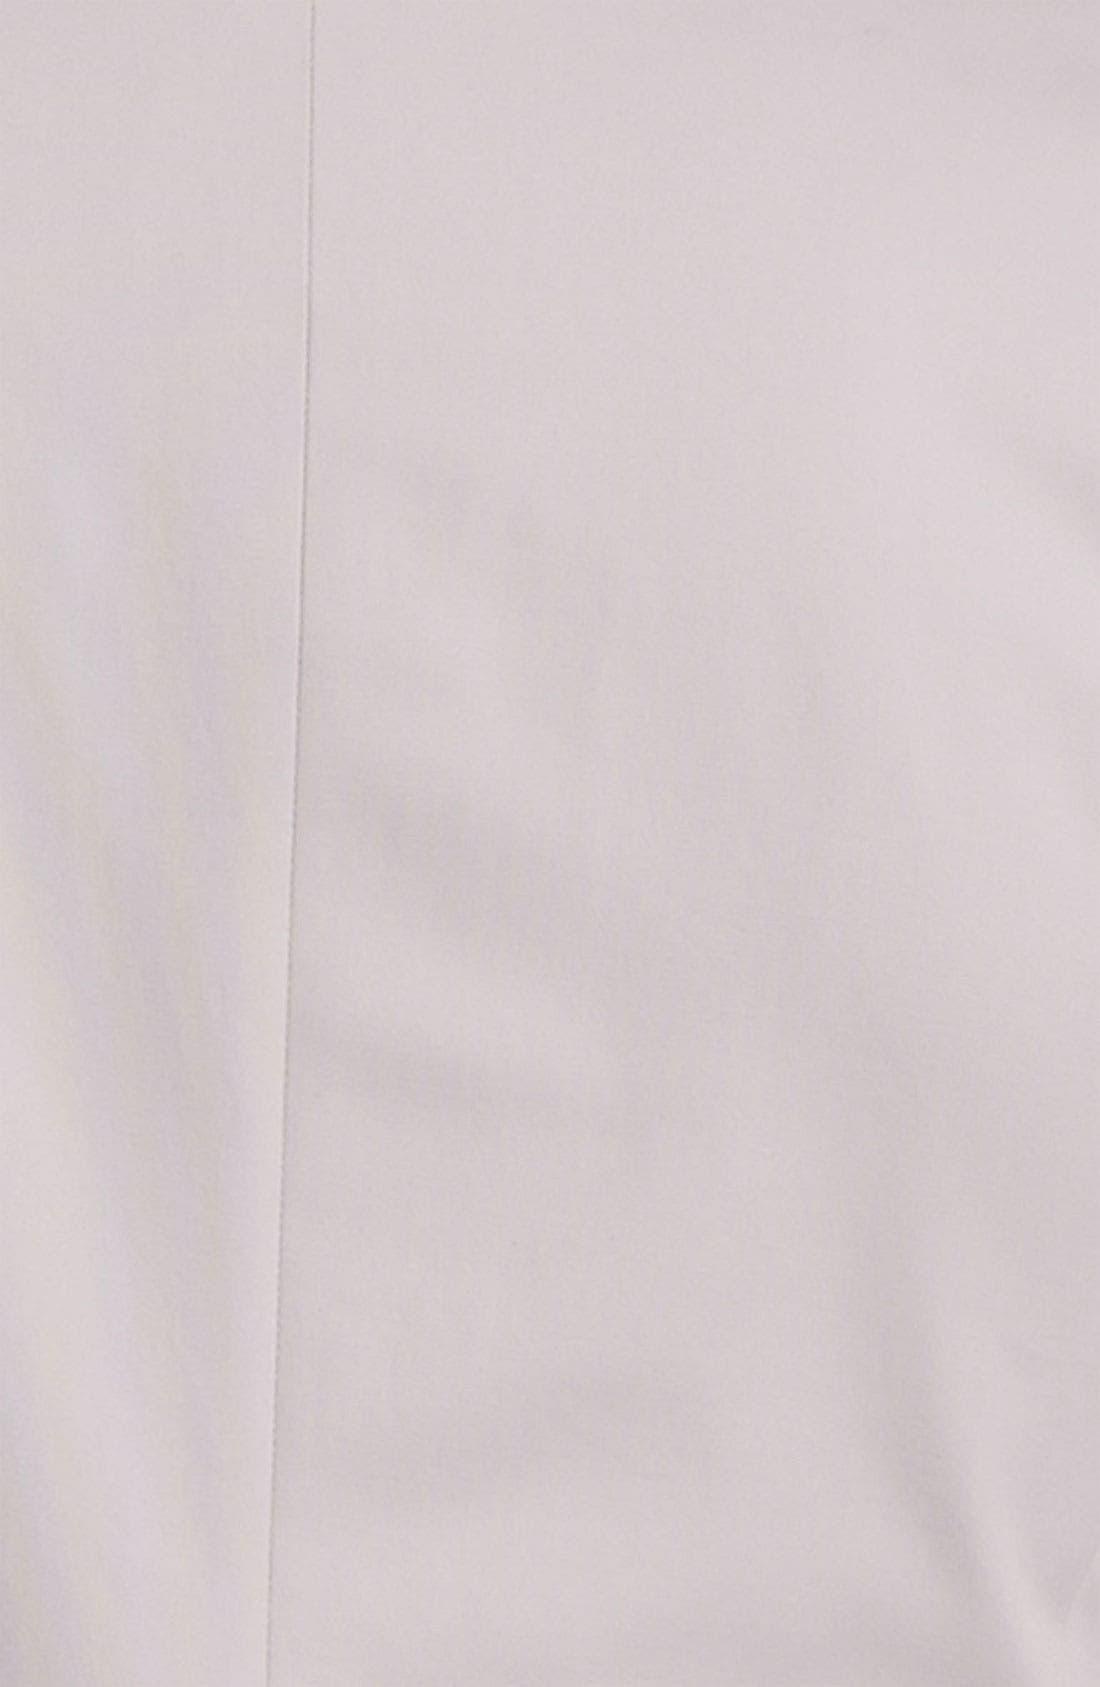 ZZDNUHUGO BOSS, HUGO 'Aeris' Trim Fit Cotton Blend Blazer, Main thumbnail 1, color, 030